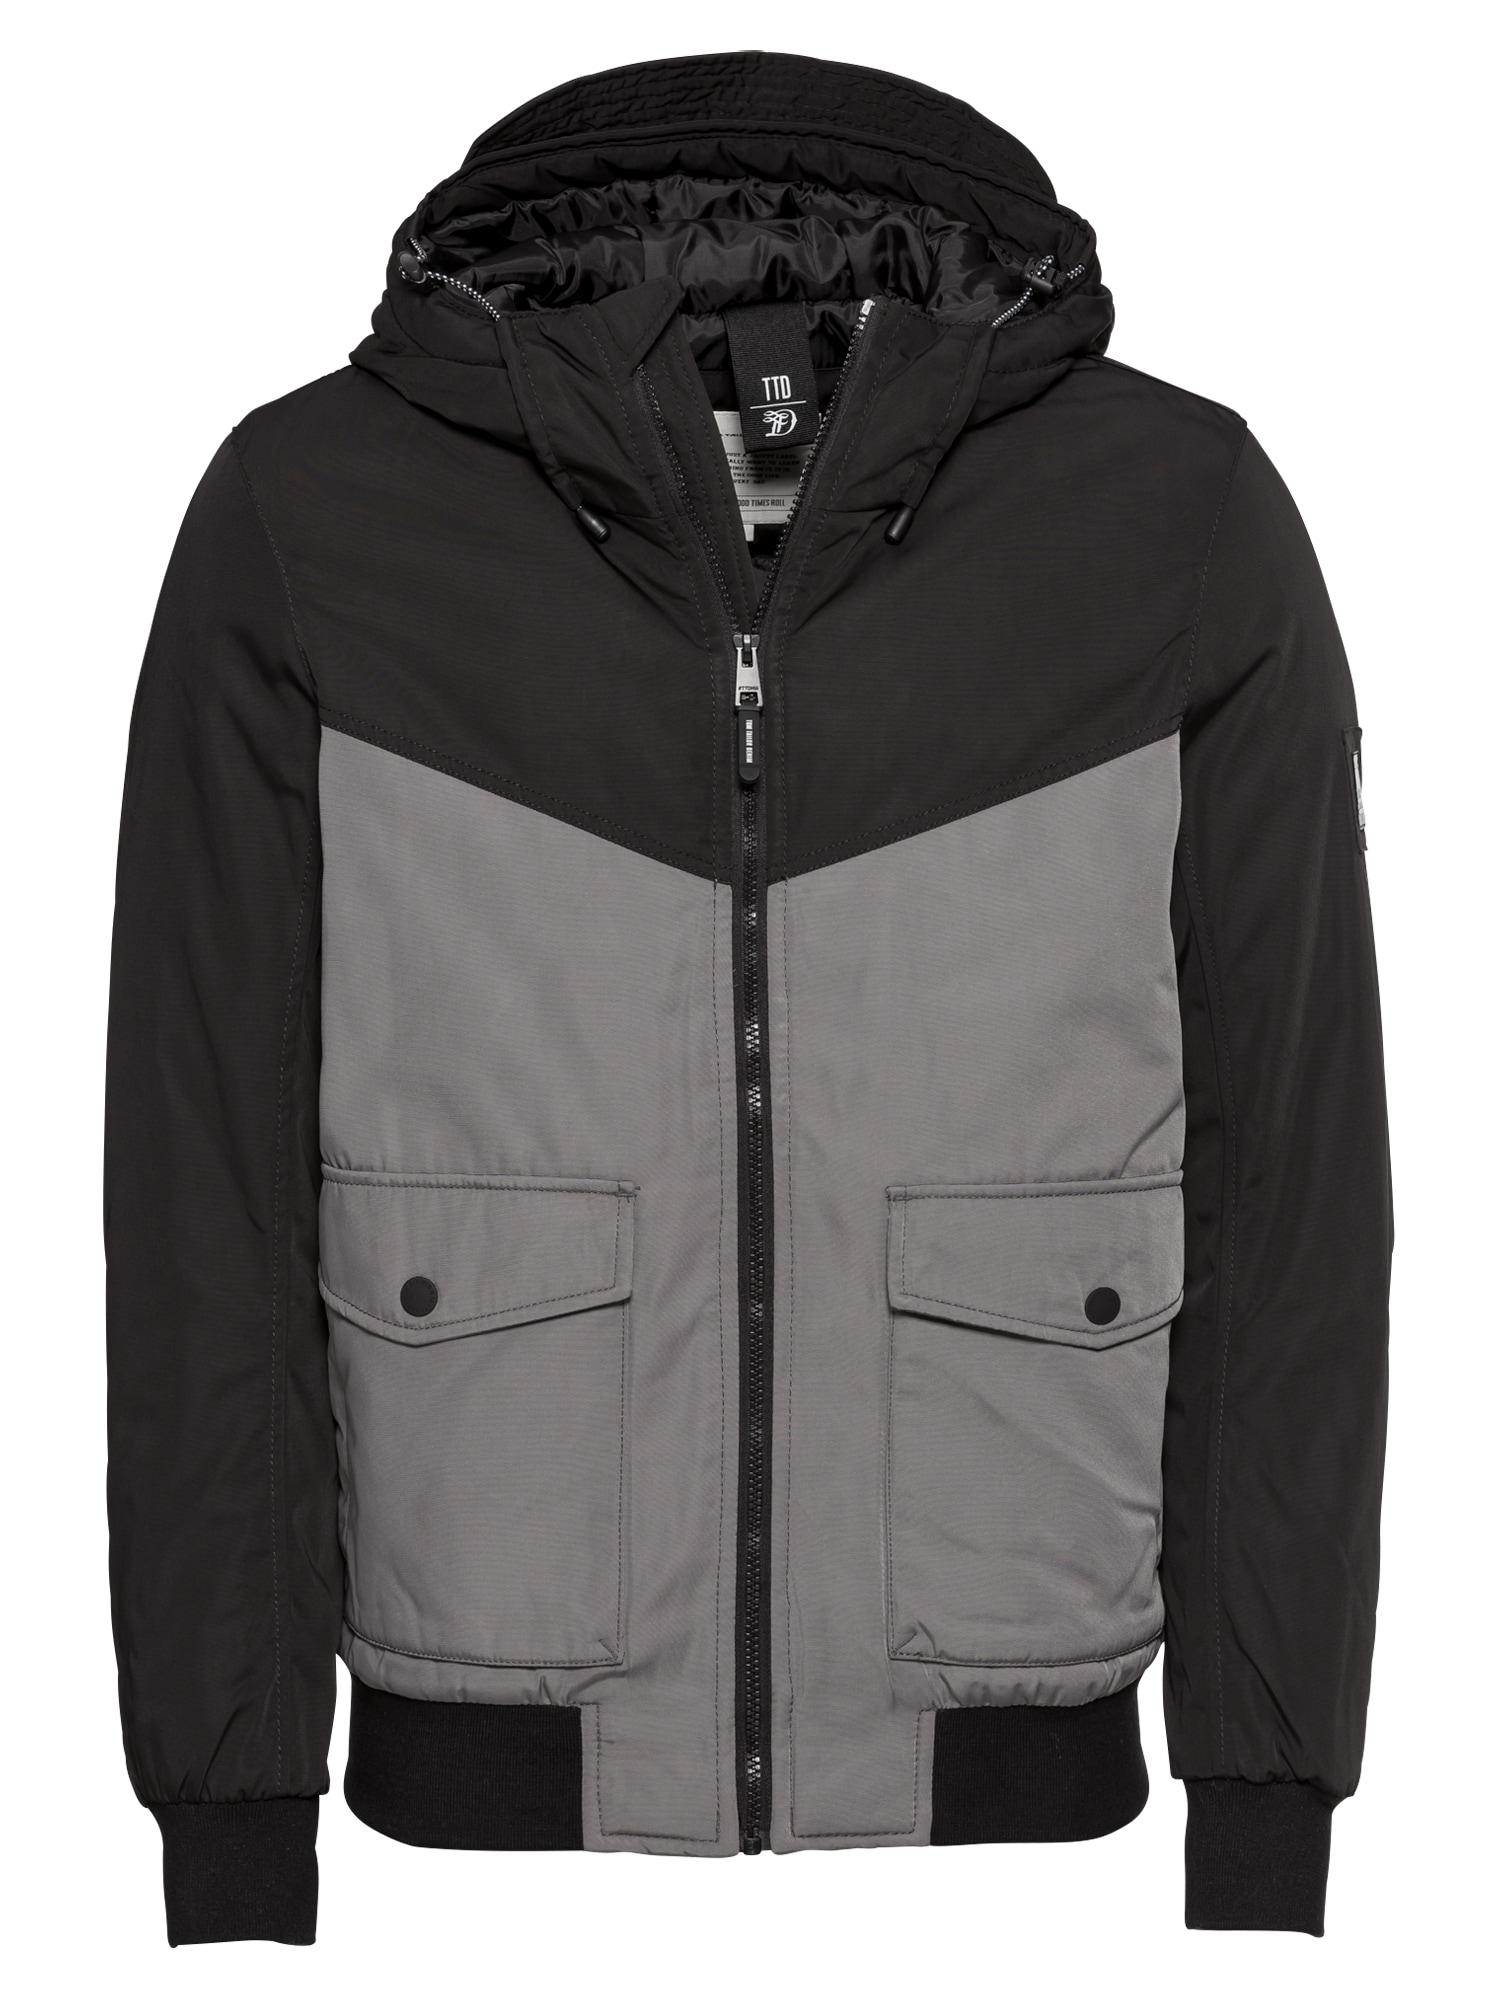 Zimní bunda šedá černá TOM TAILOR DENIM